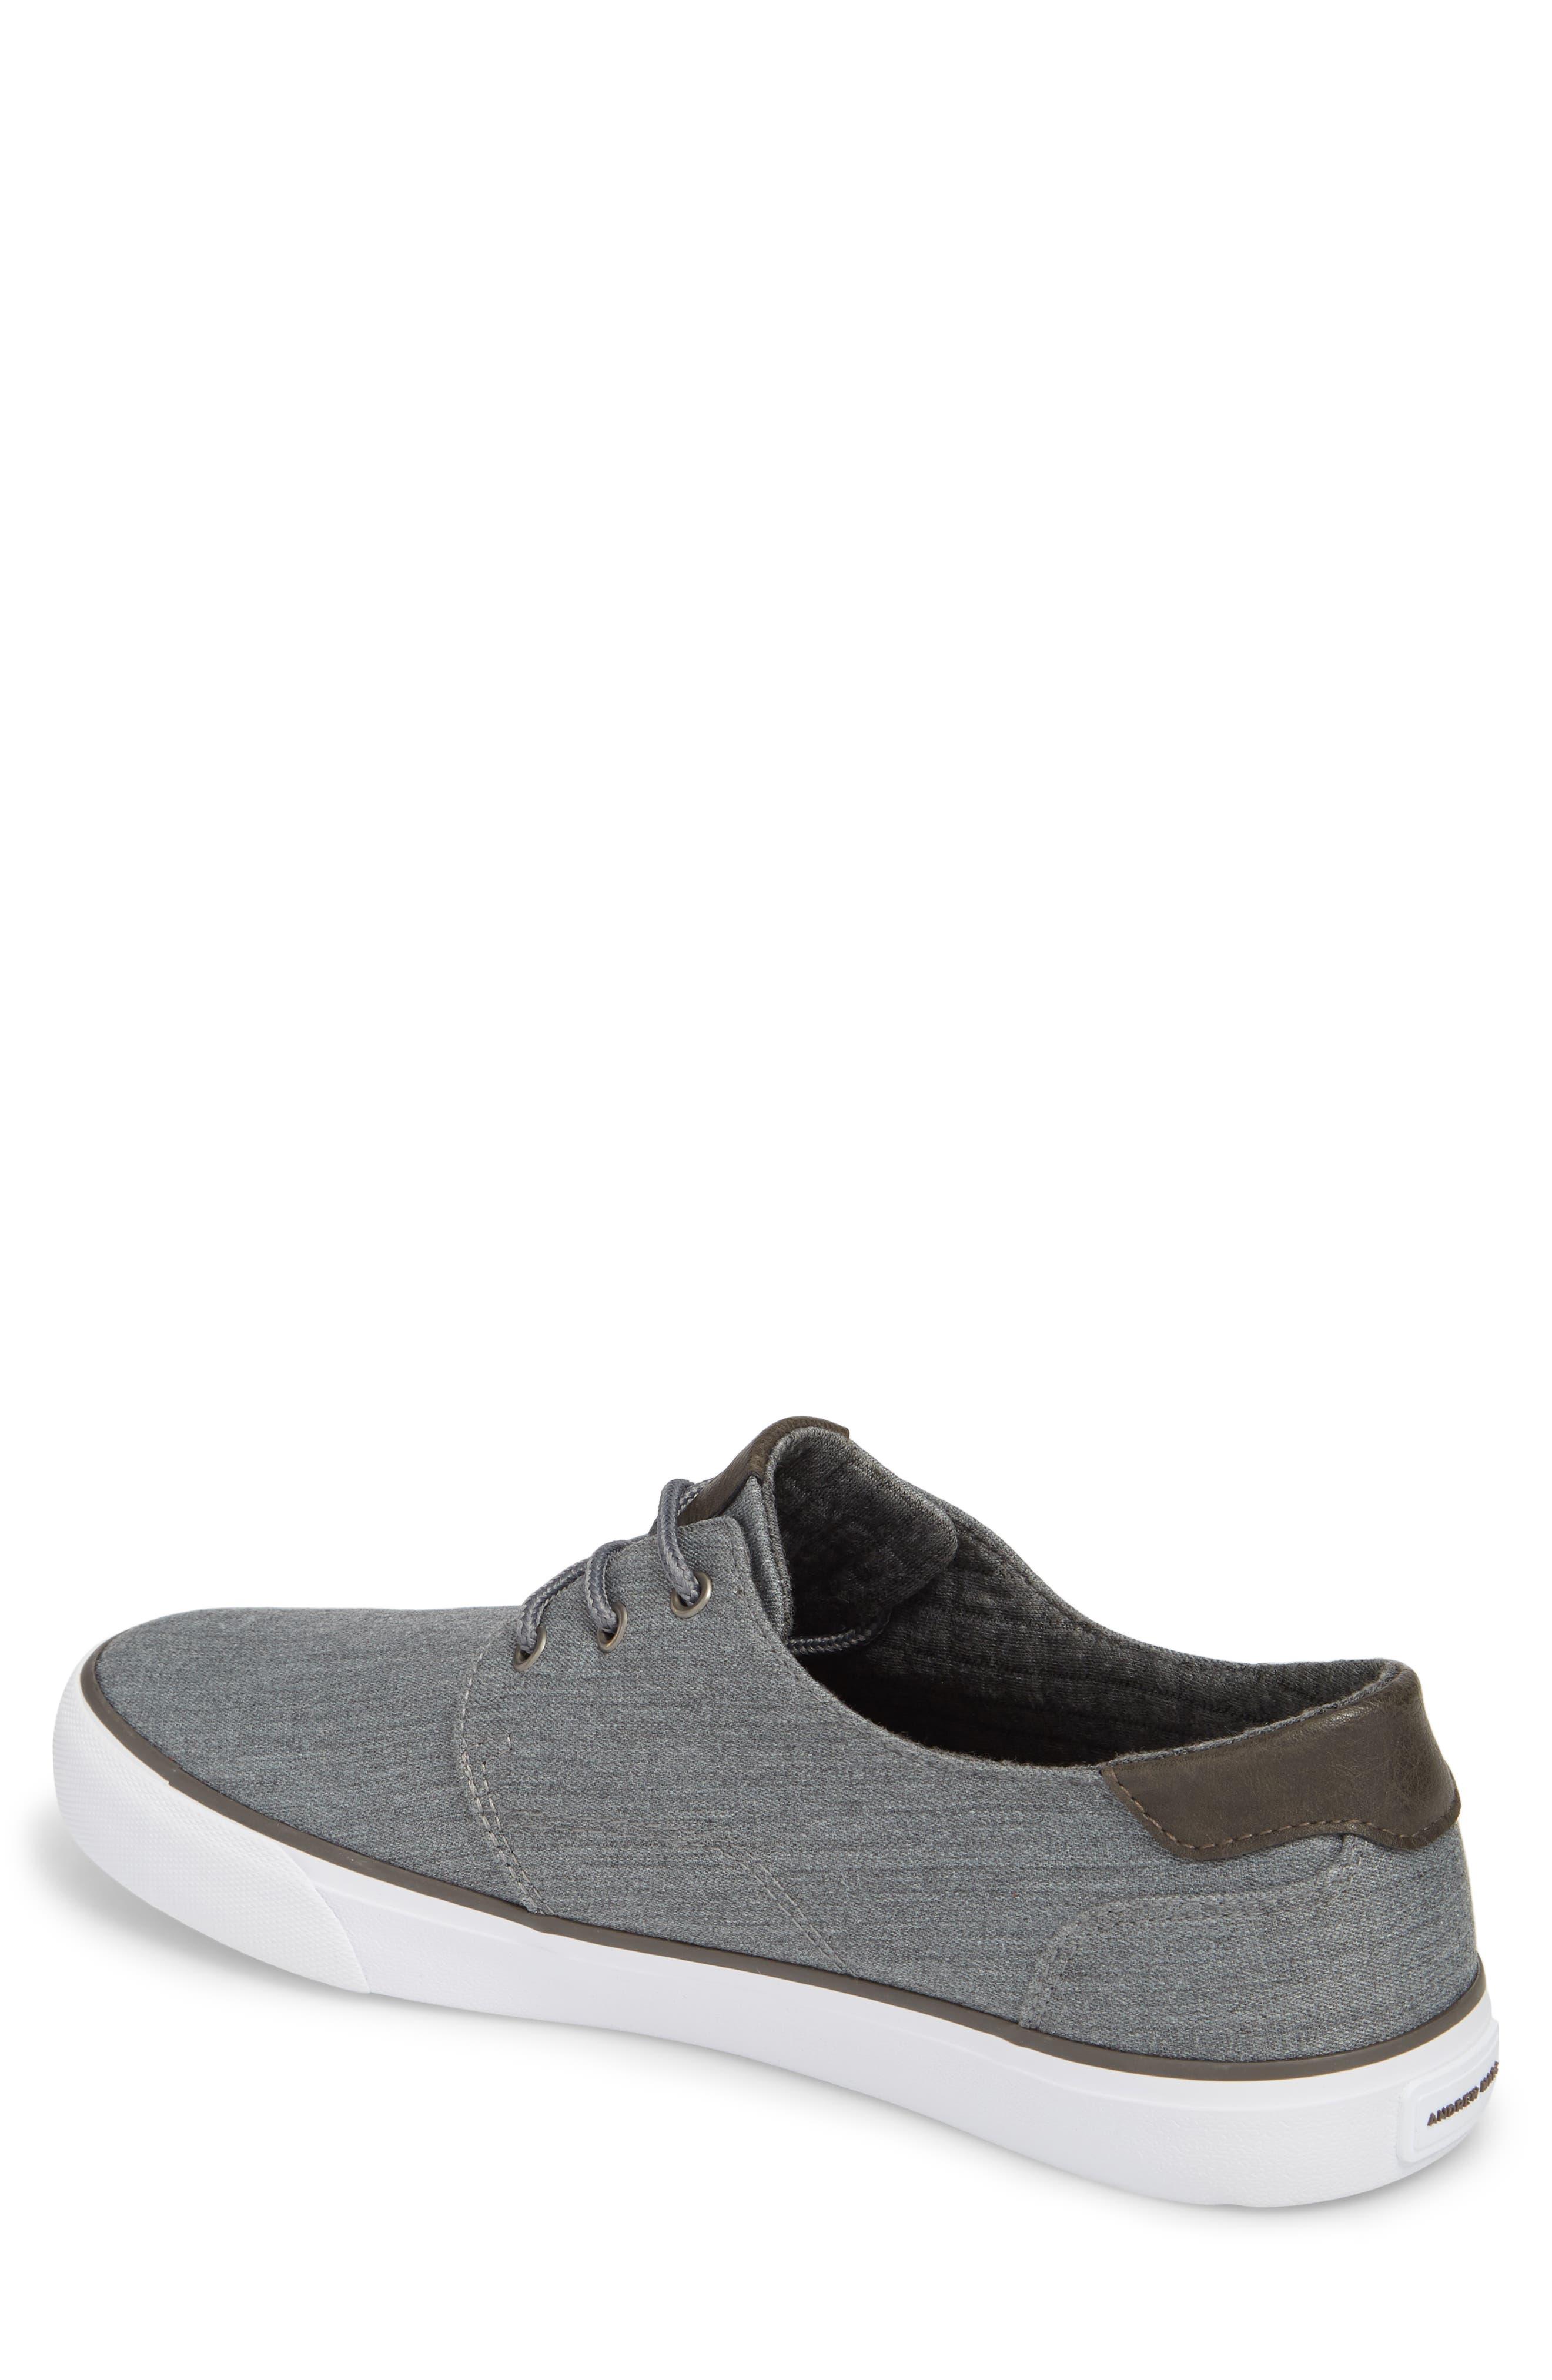 Briggs Low Top Sneaker,                             Alternate thumbnail 2, color,                             CHARCOAL/ DARK GREY/ WHITE